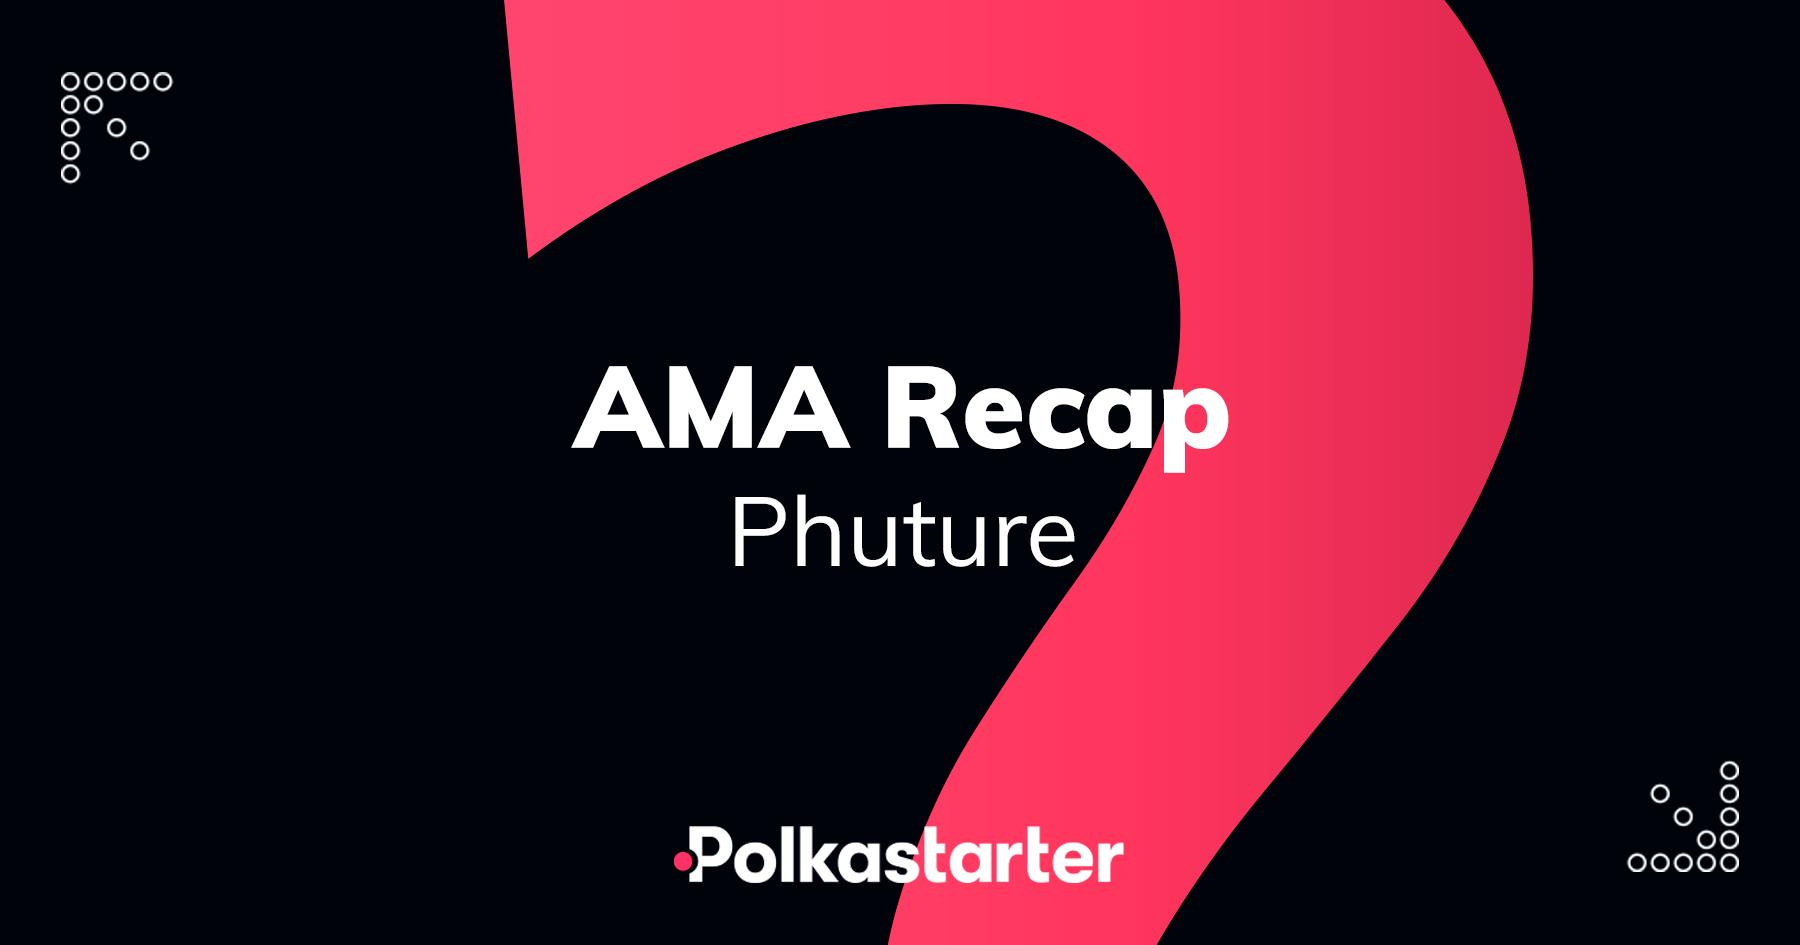 [PolkaStarter] Polkastarter and Phuture AMA Recap - AZCoin News